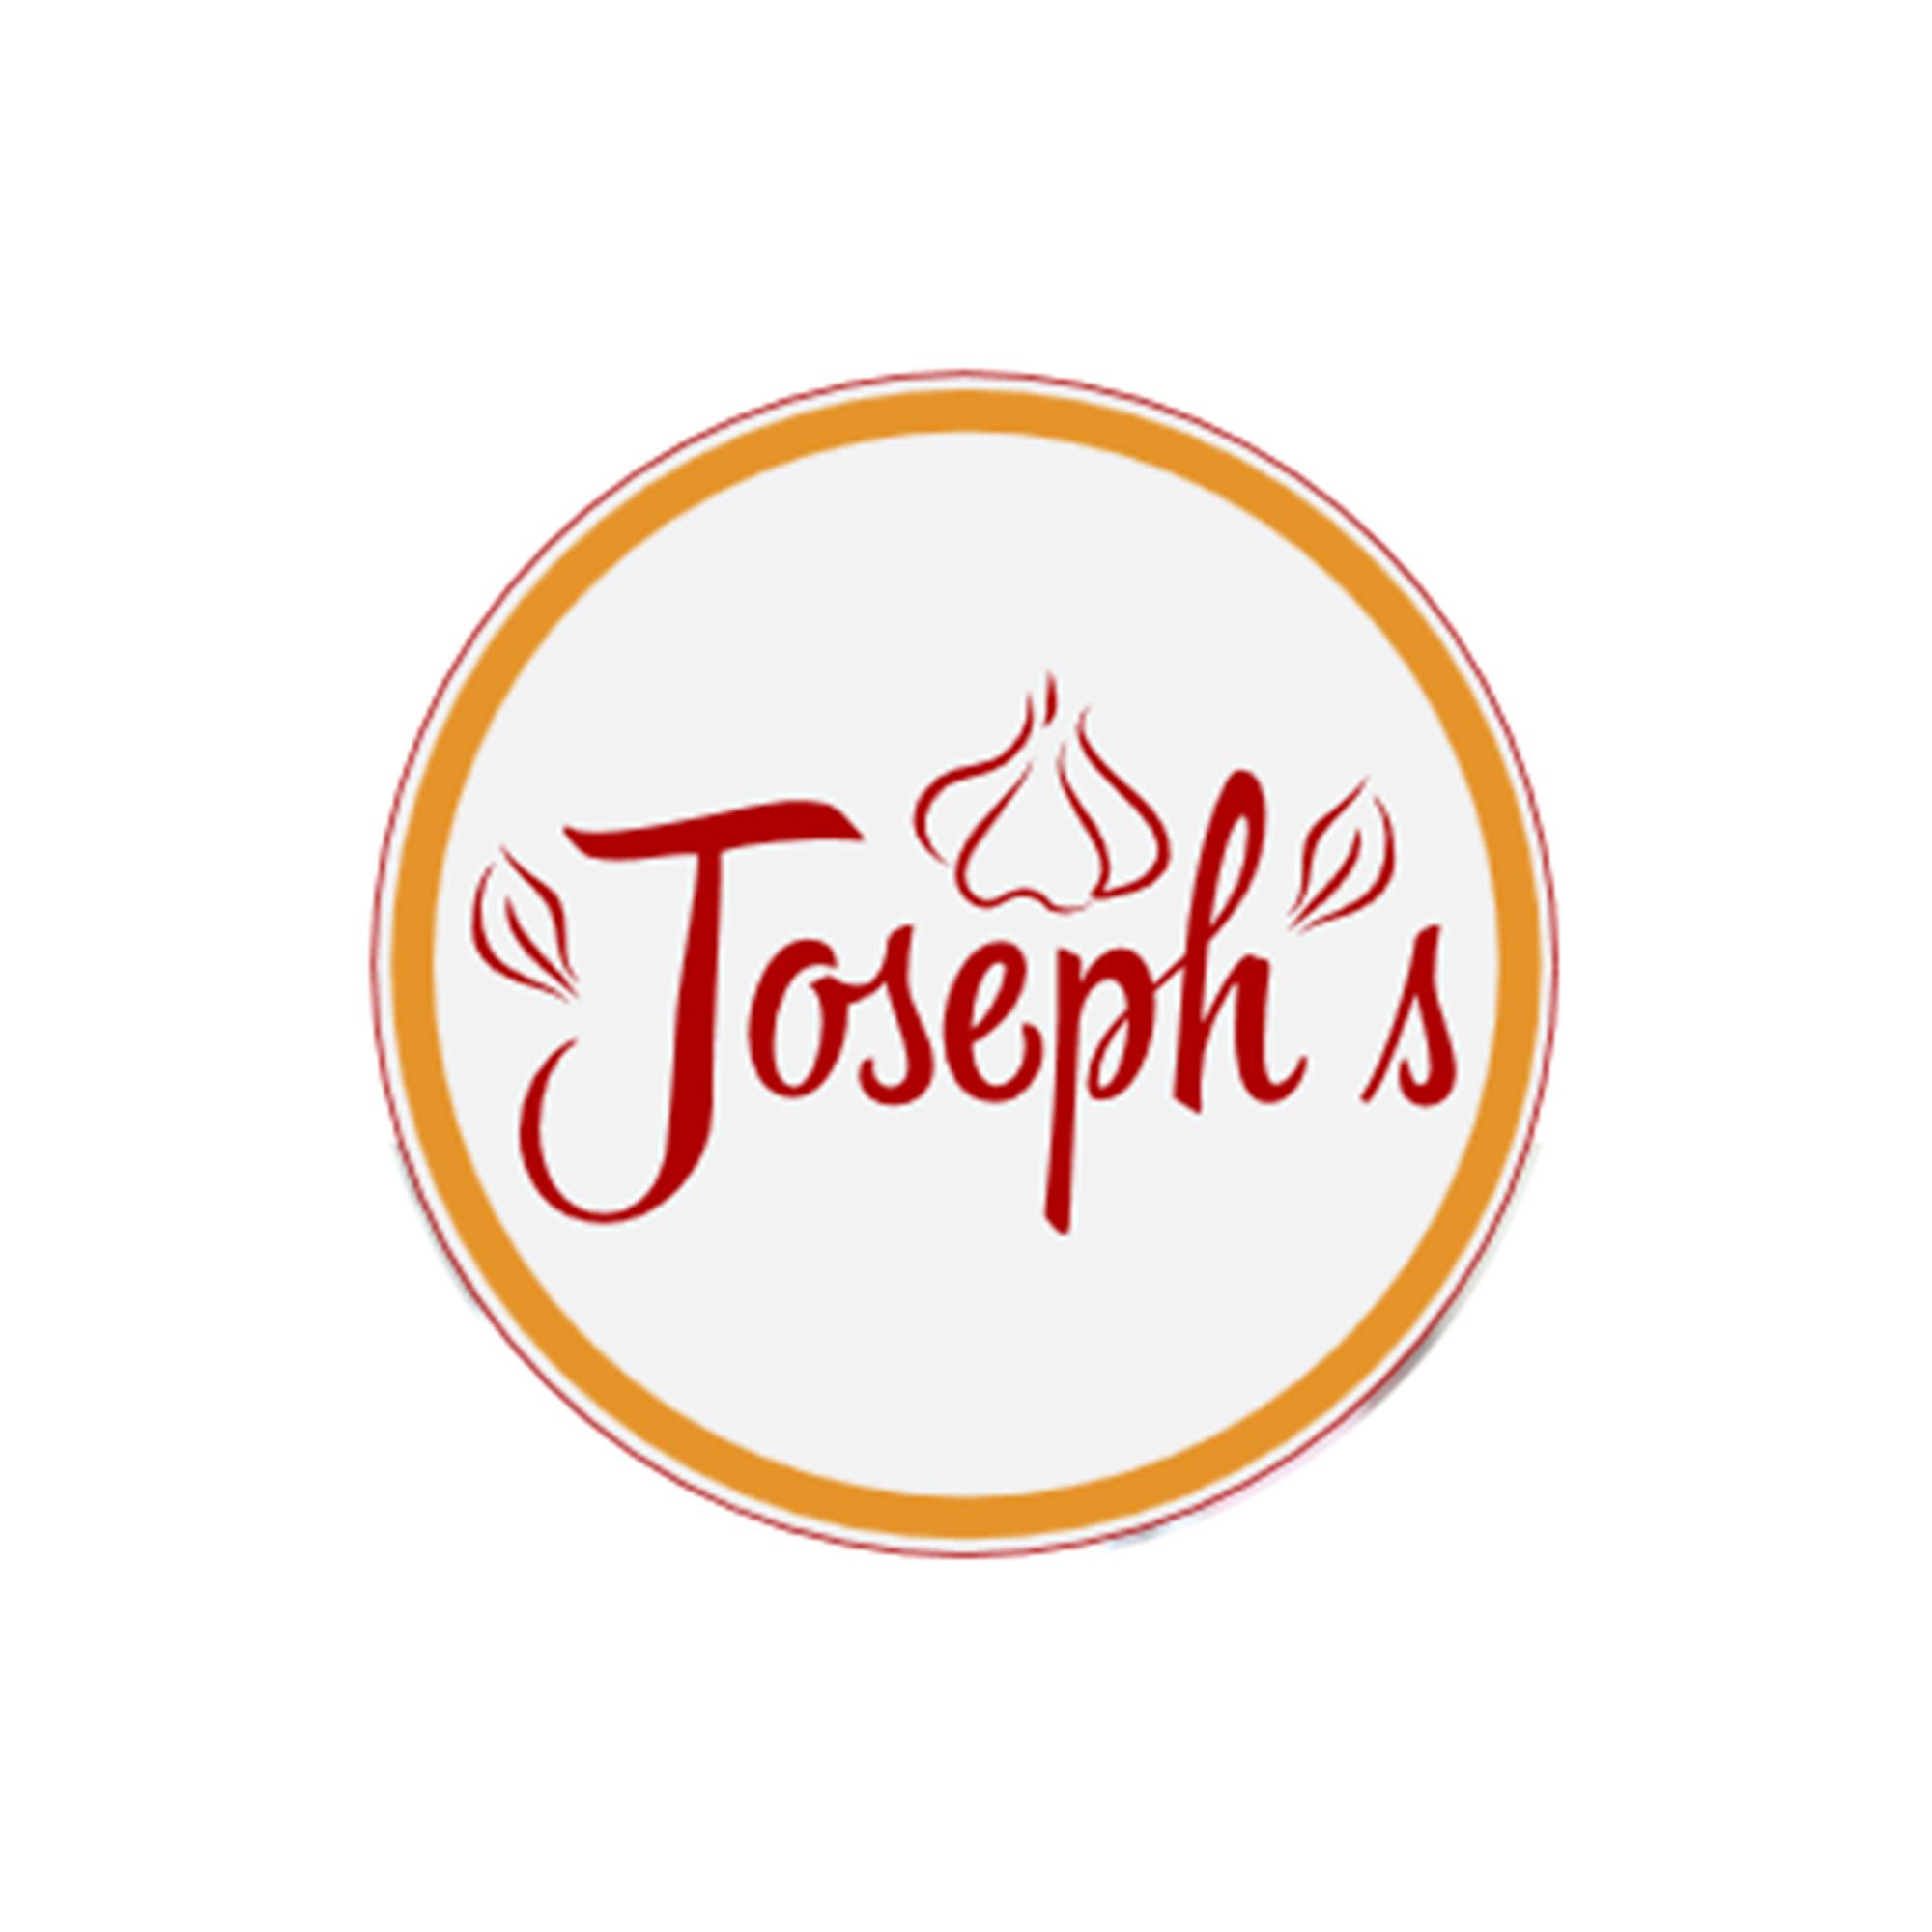 Joseph's Pizza & Restaurant, Jackson NJ